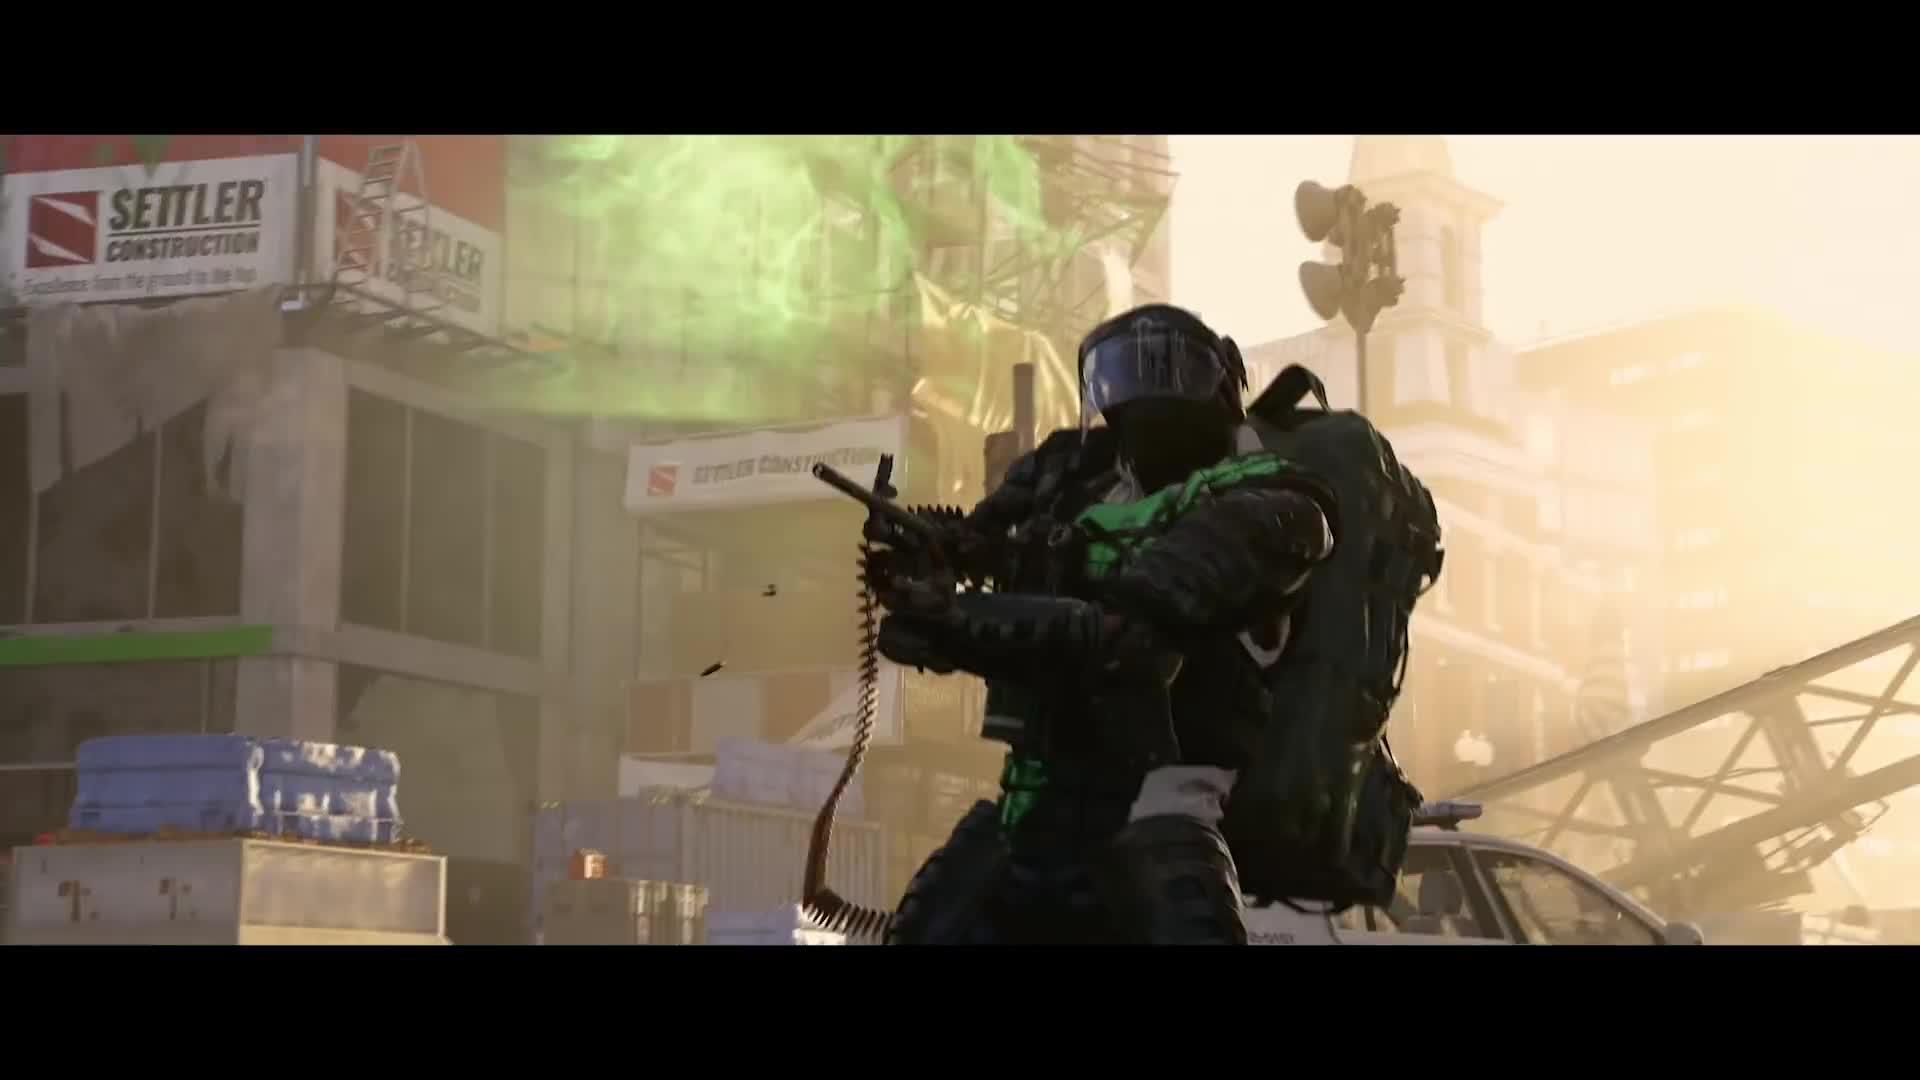 Trailer, Ubisoft, actionspiel, Tom Clancy, The Division 2, Tom Clancy's The Division 2